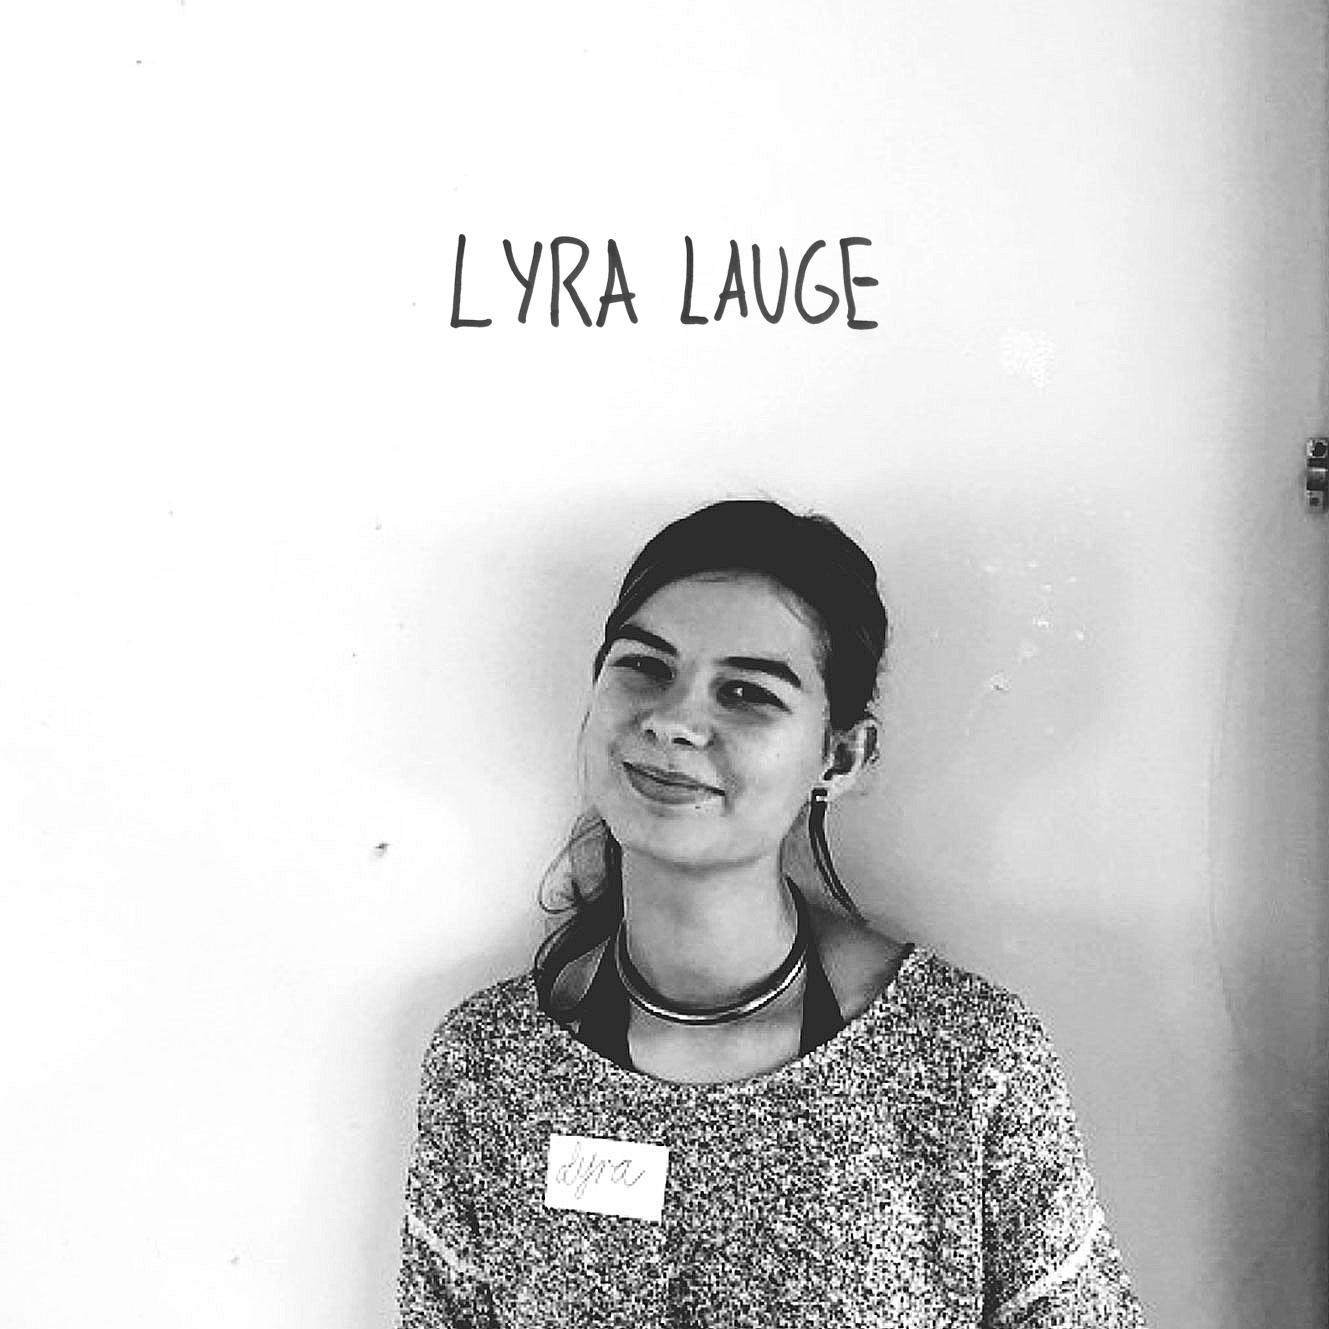 LYRA LAUGE